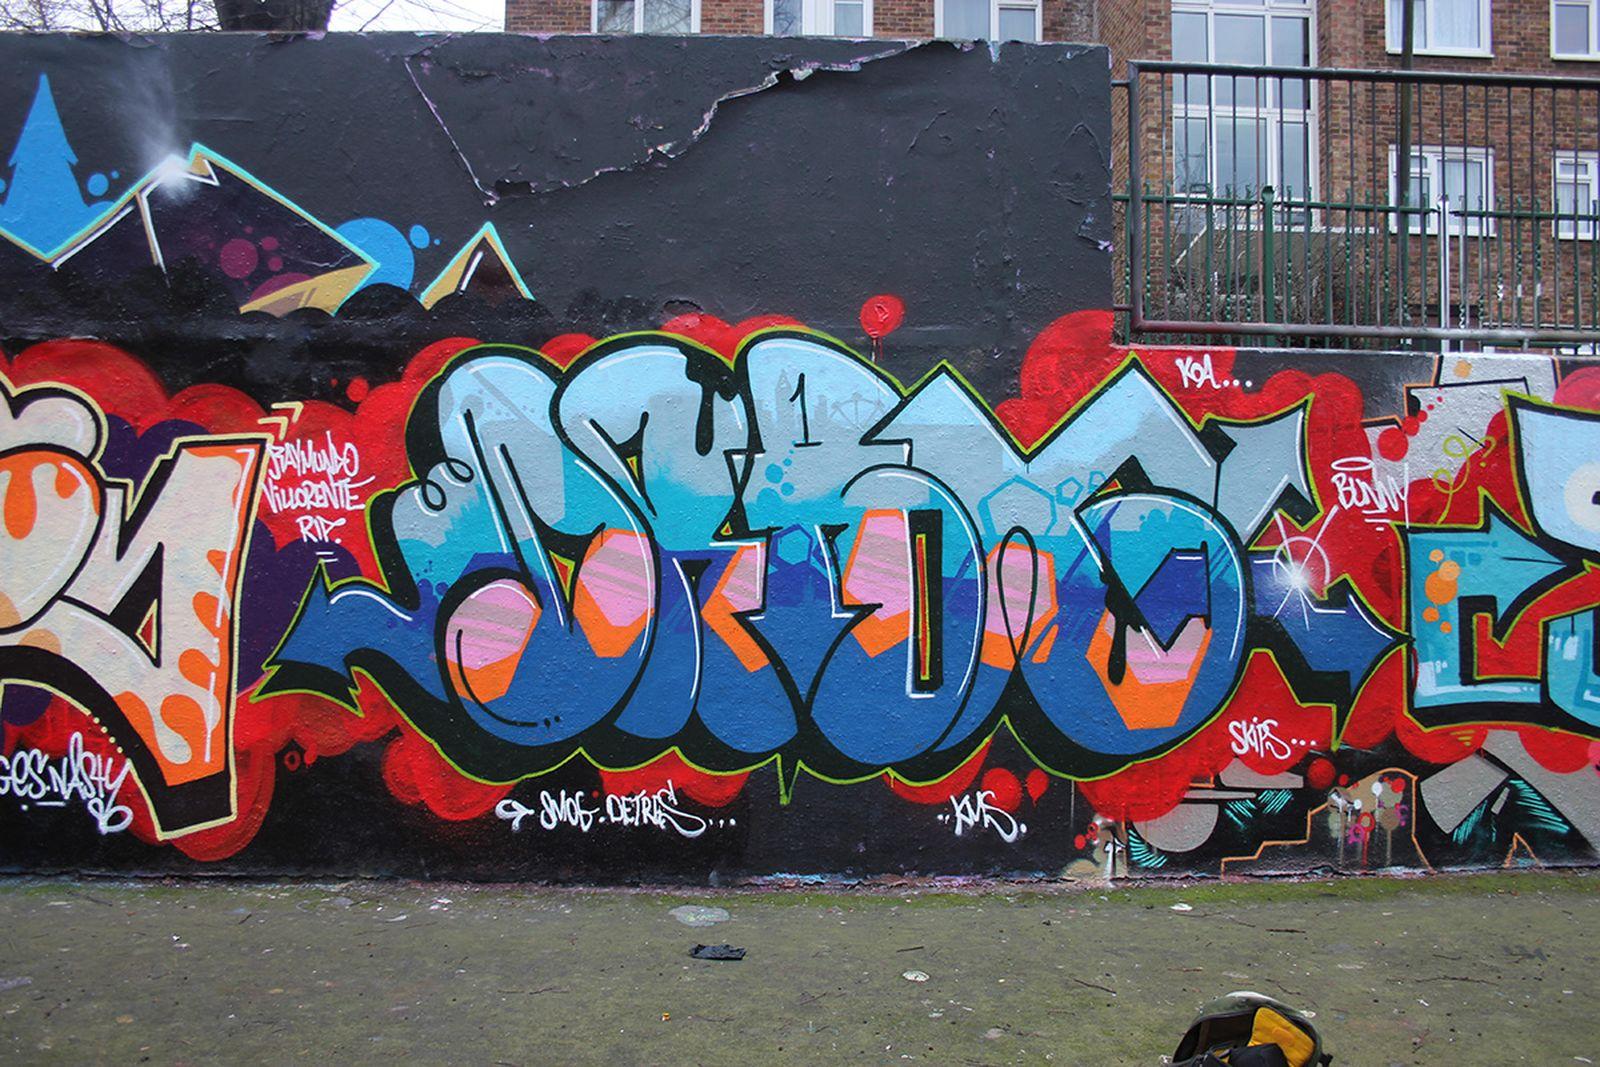 Drax, Stockwell, South London, circa 2015